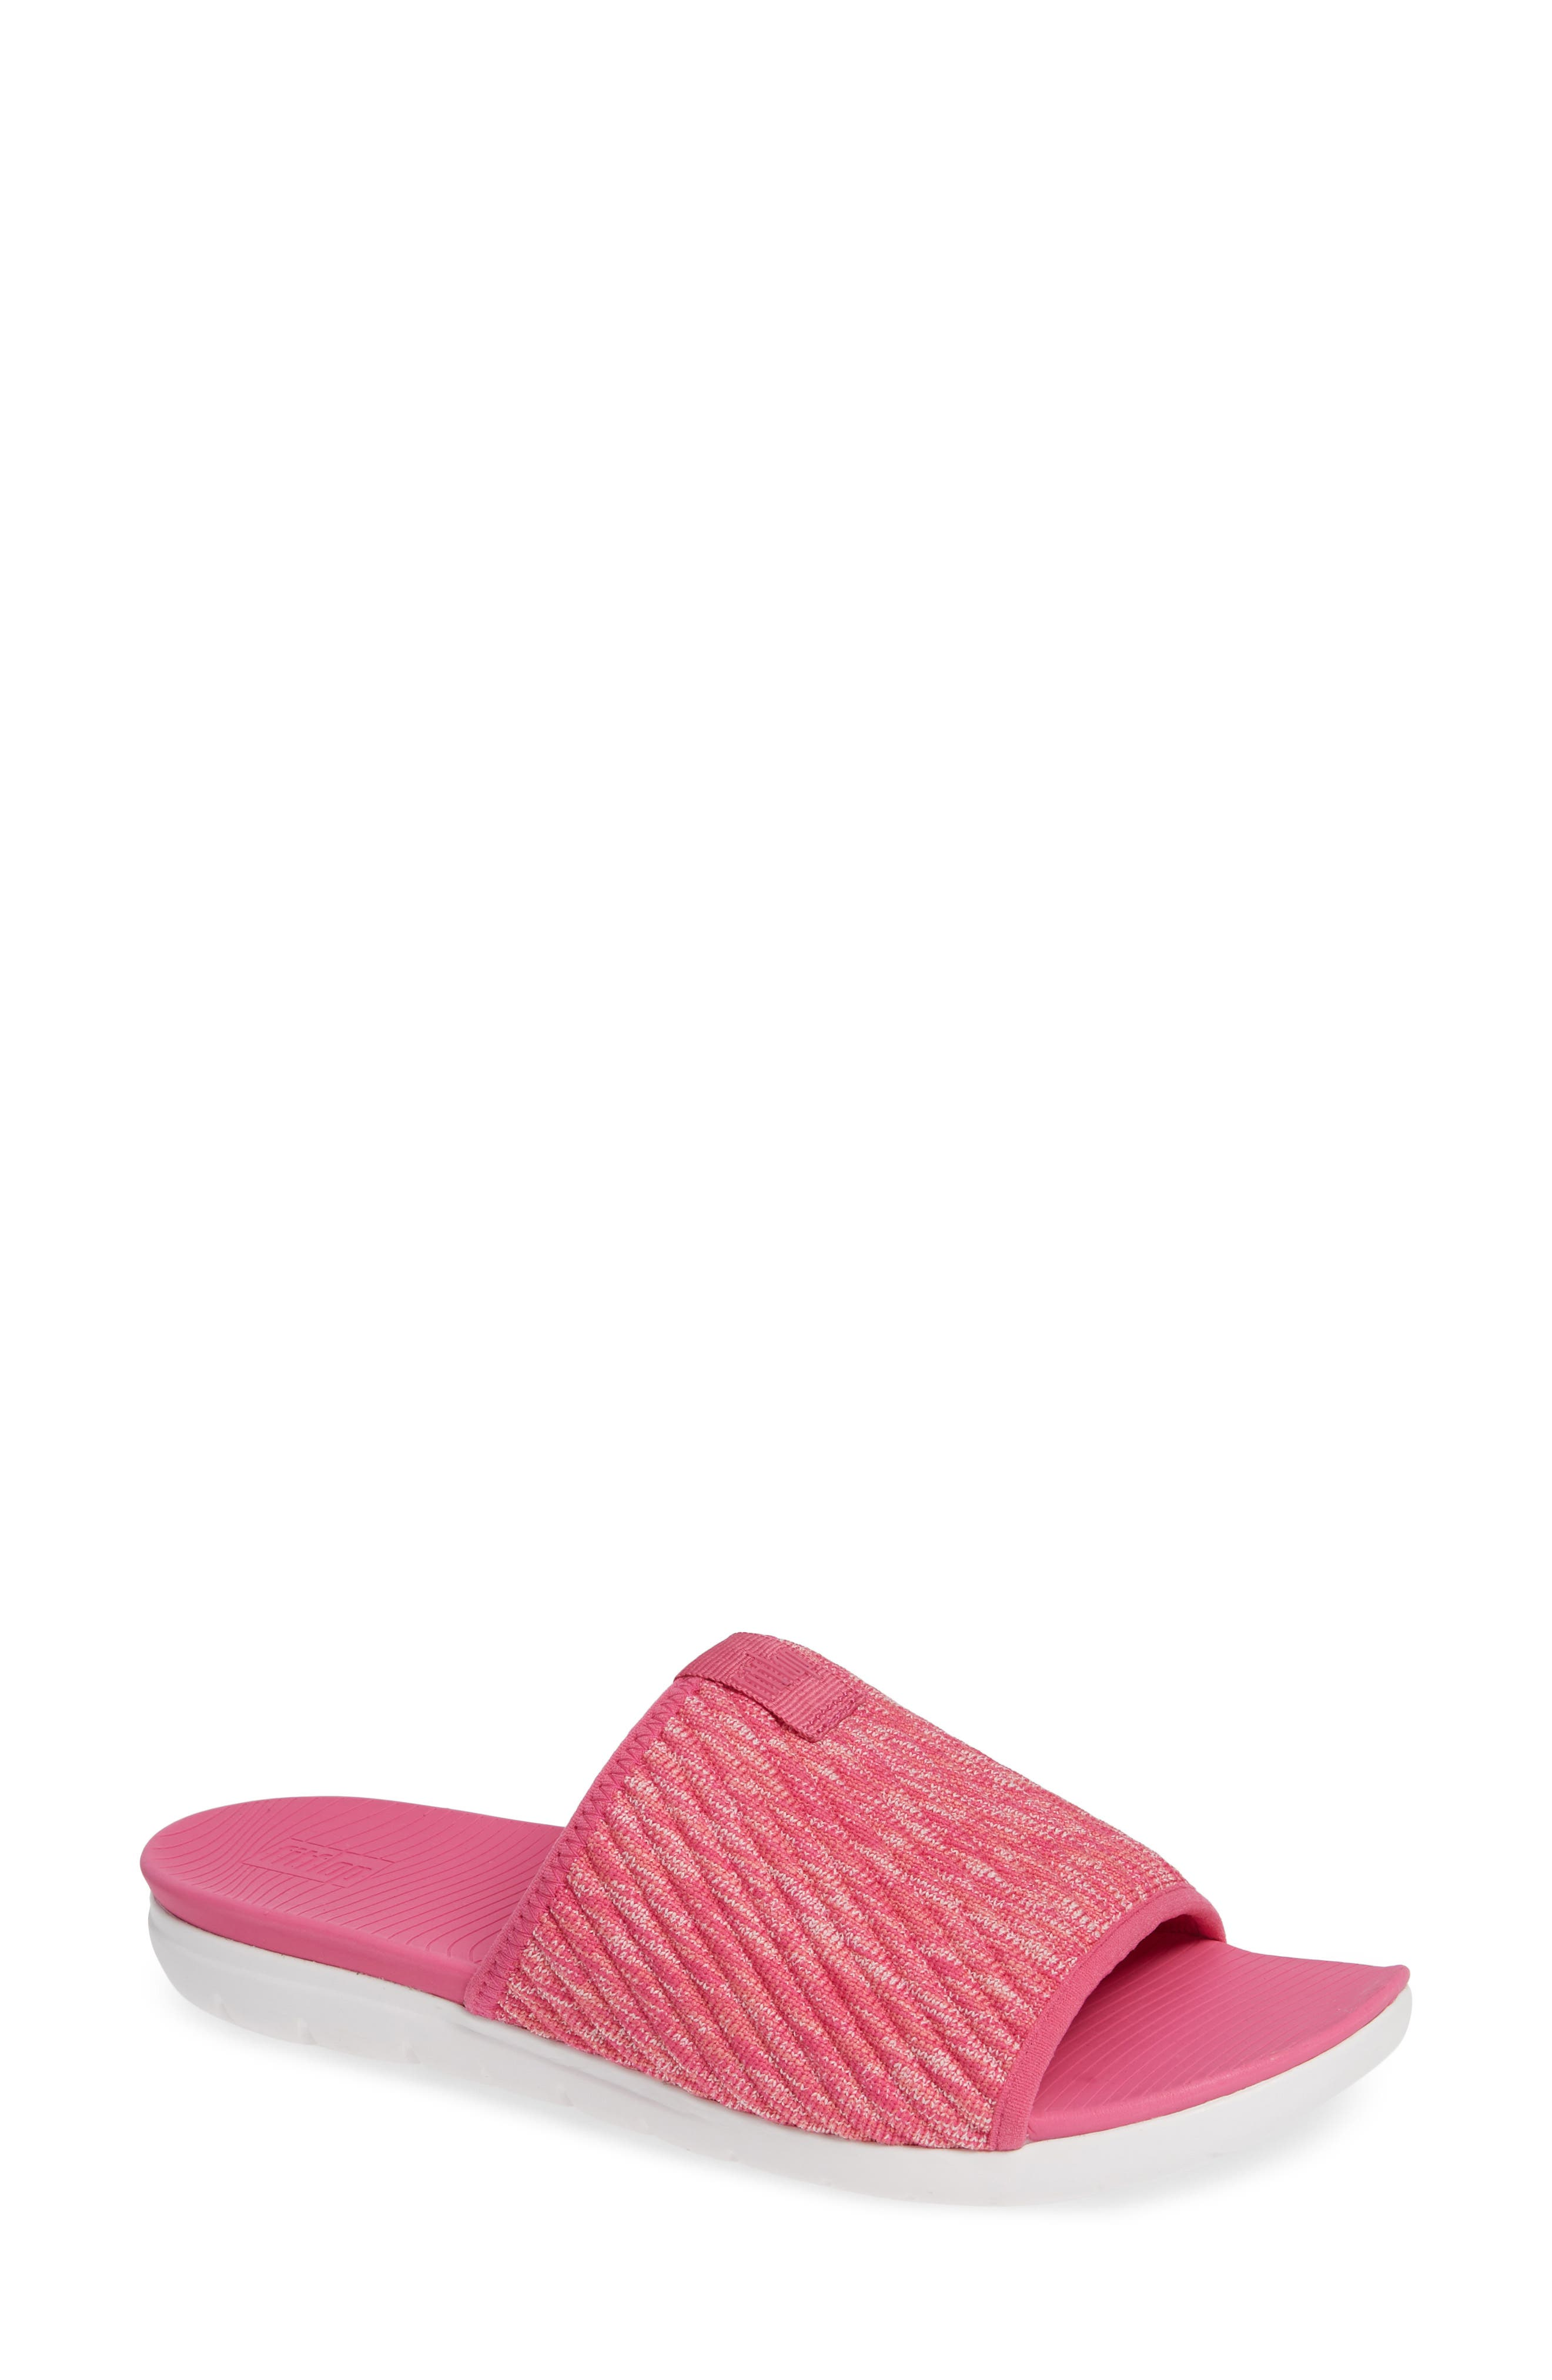 e0cc9e05d33c Fitflop Artknit Slide Sandal